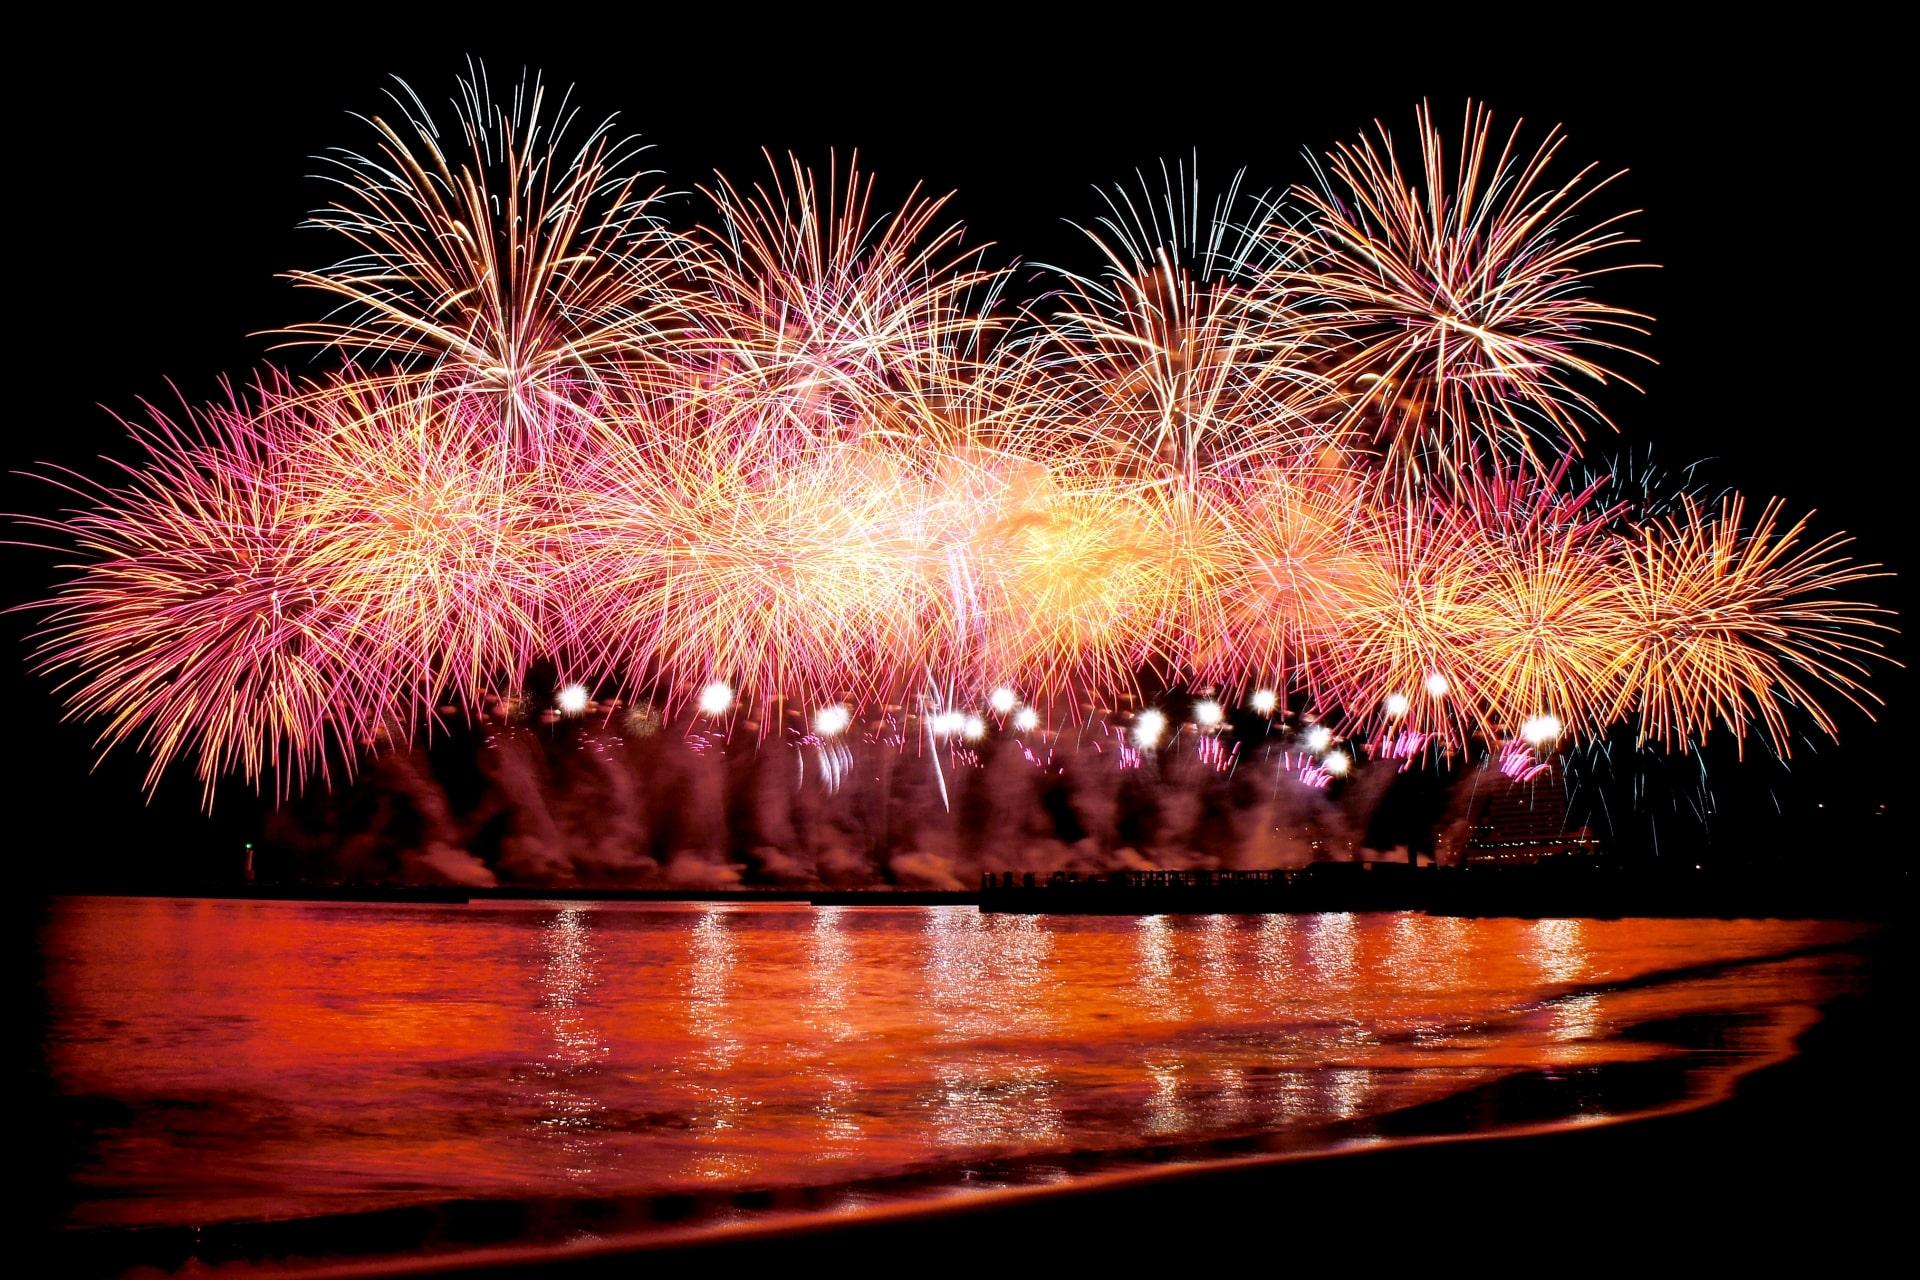 Atami Fireworks Festival